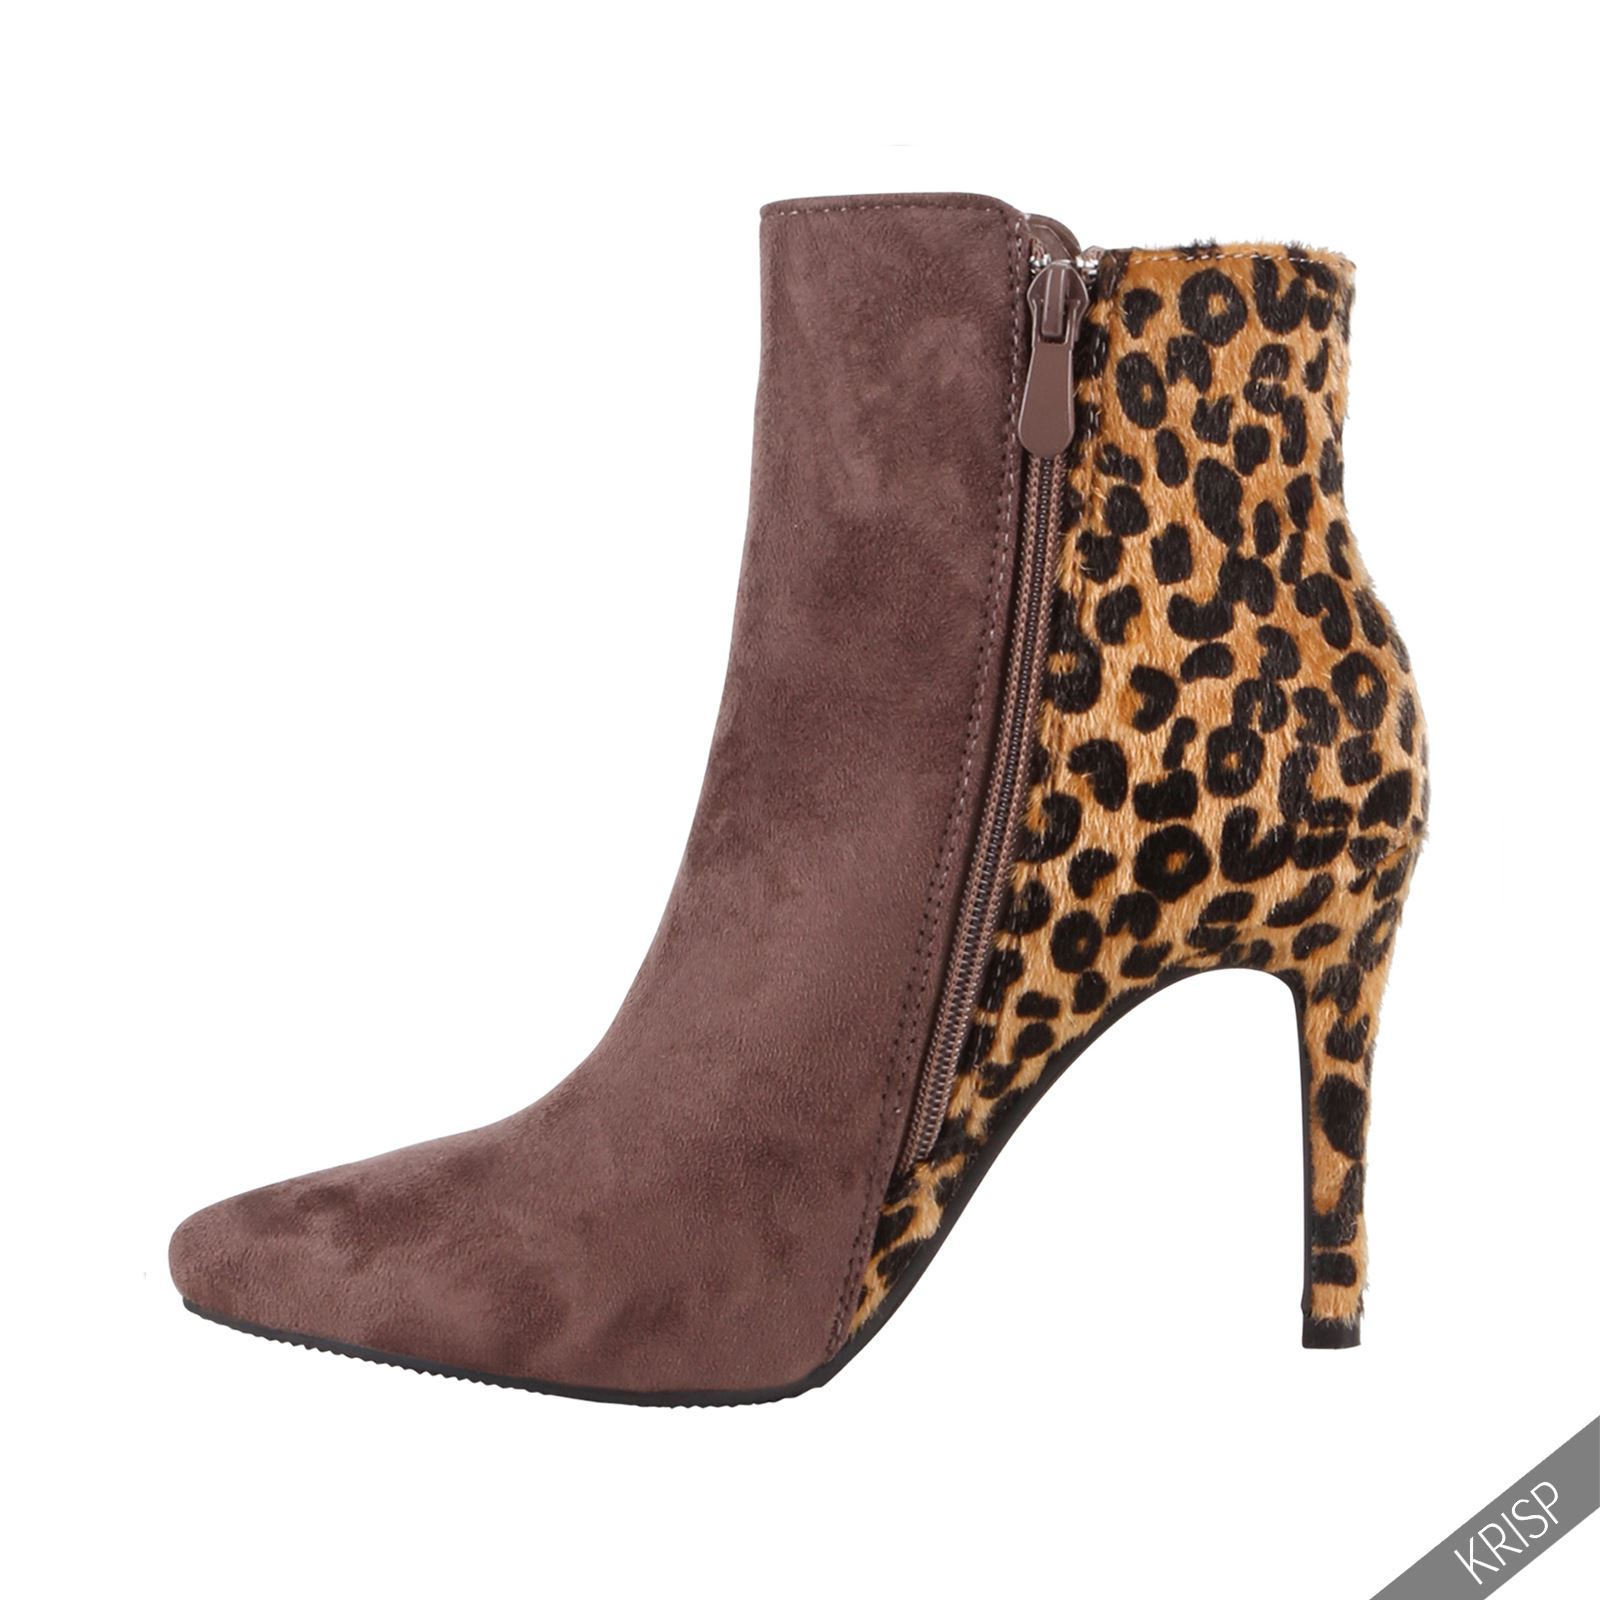 femmes bottines bottes chaussures cheville talon aiguille imprim l opard sexy ebay. Black Bedroom Furniture Sets. Home Design Ideas